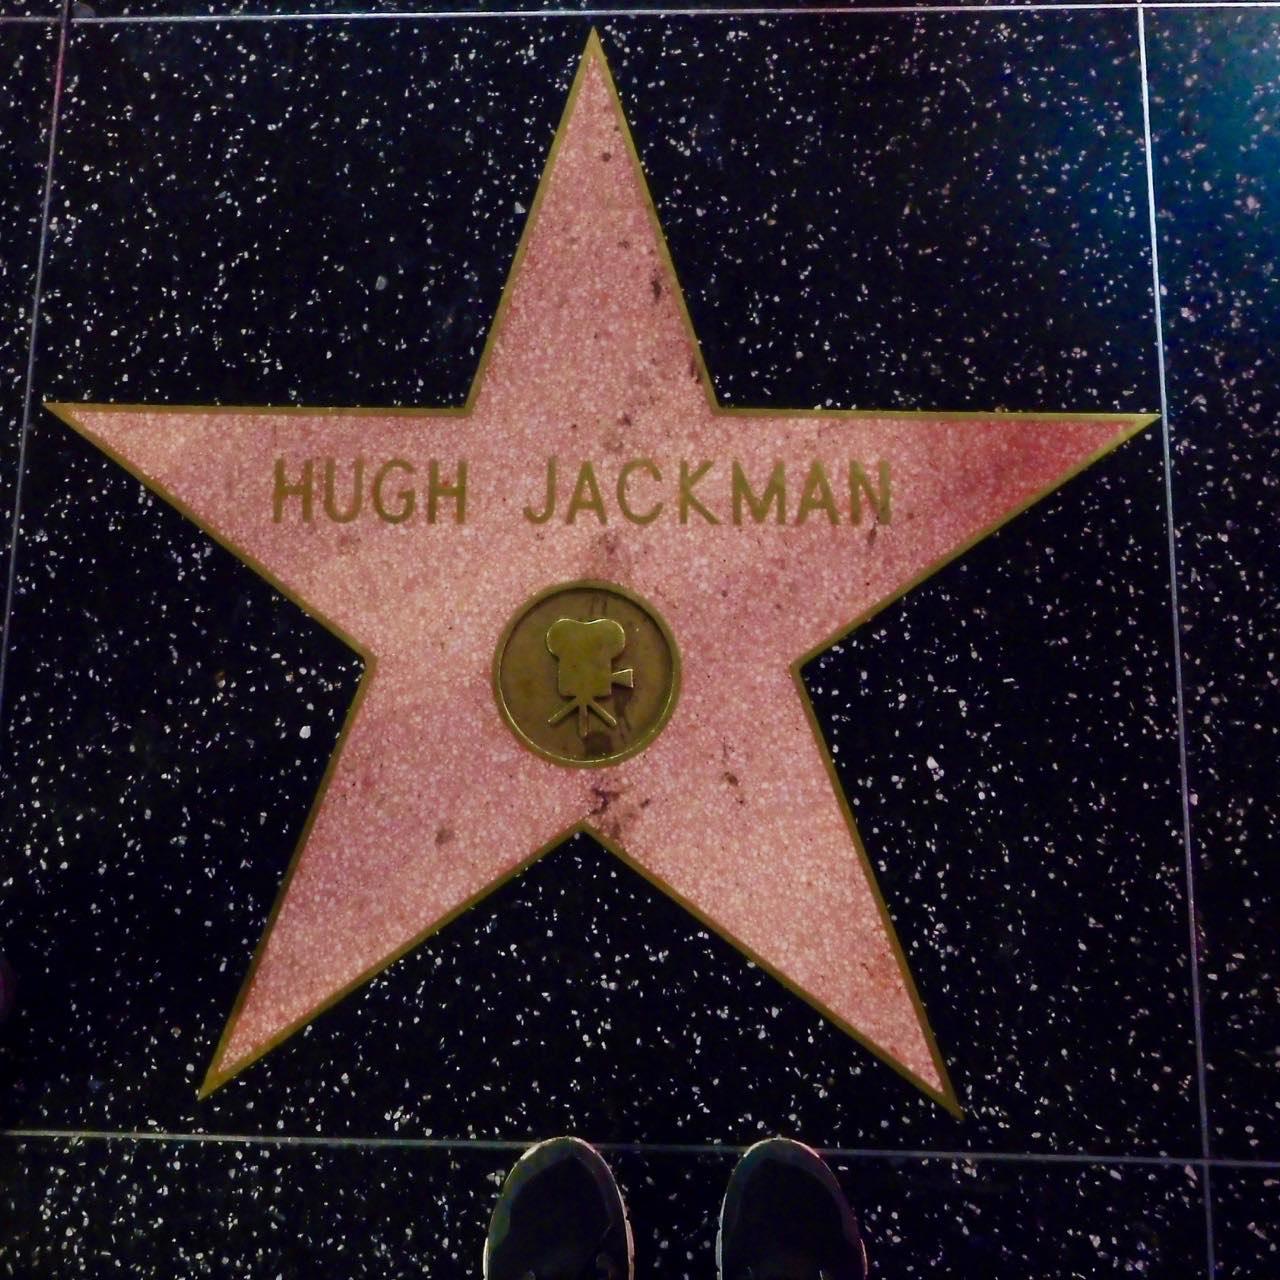 3 Days in Hollywood - Hollywood Boulevard Hugh Jackman Star